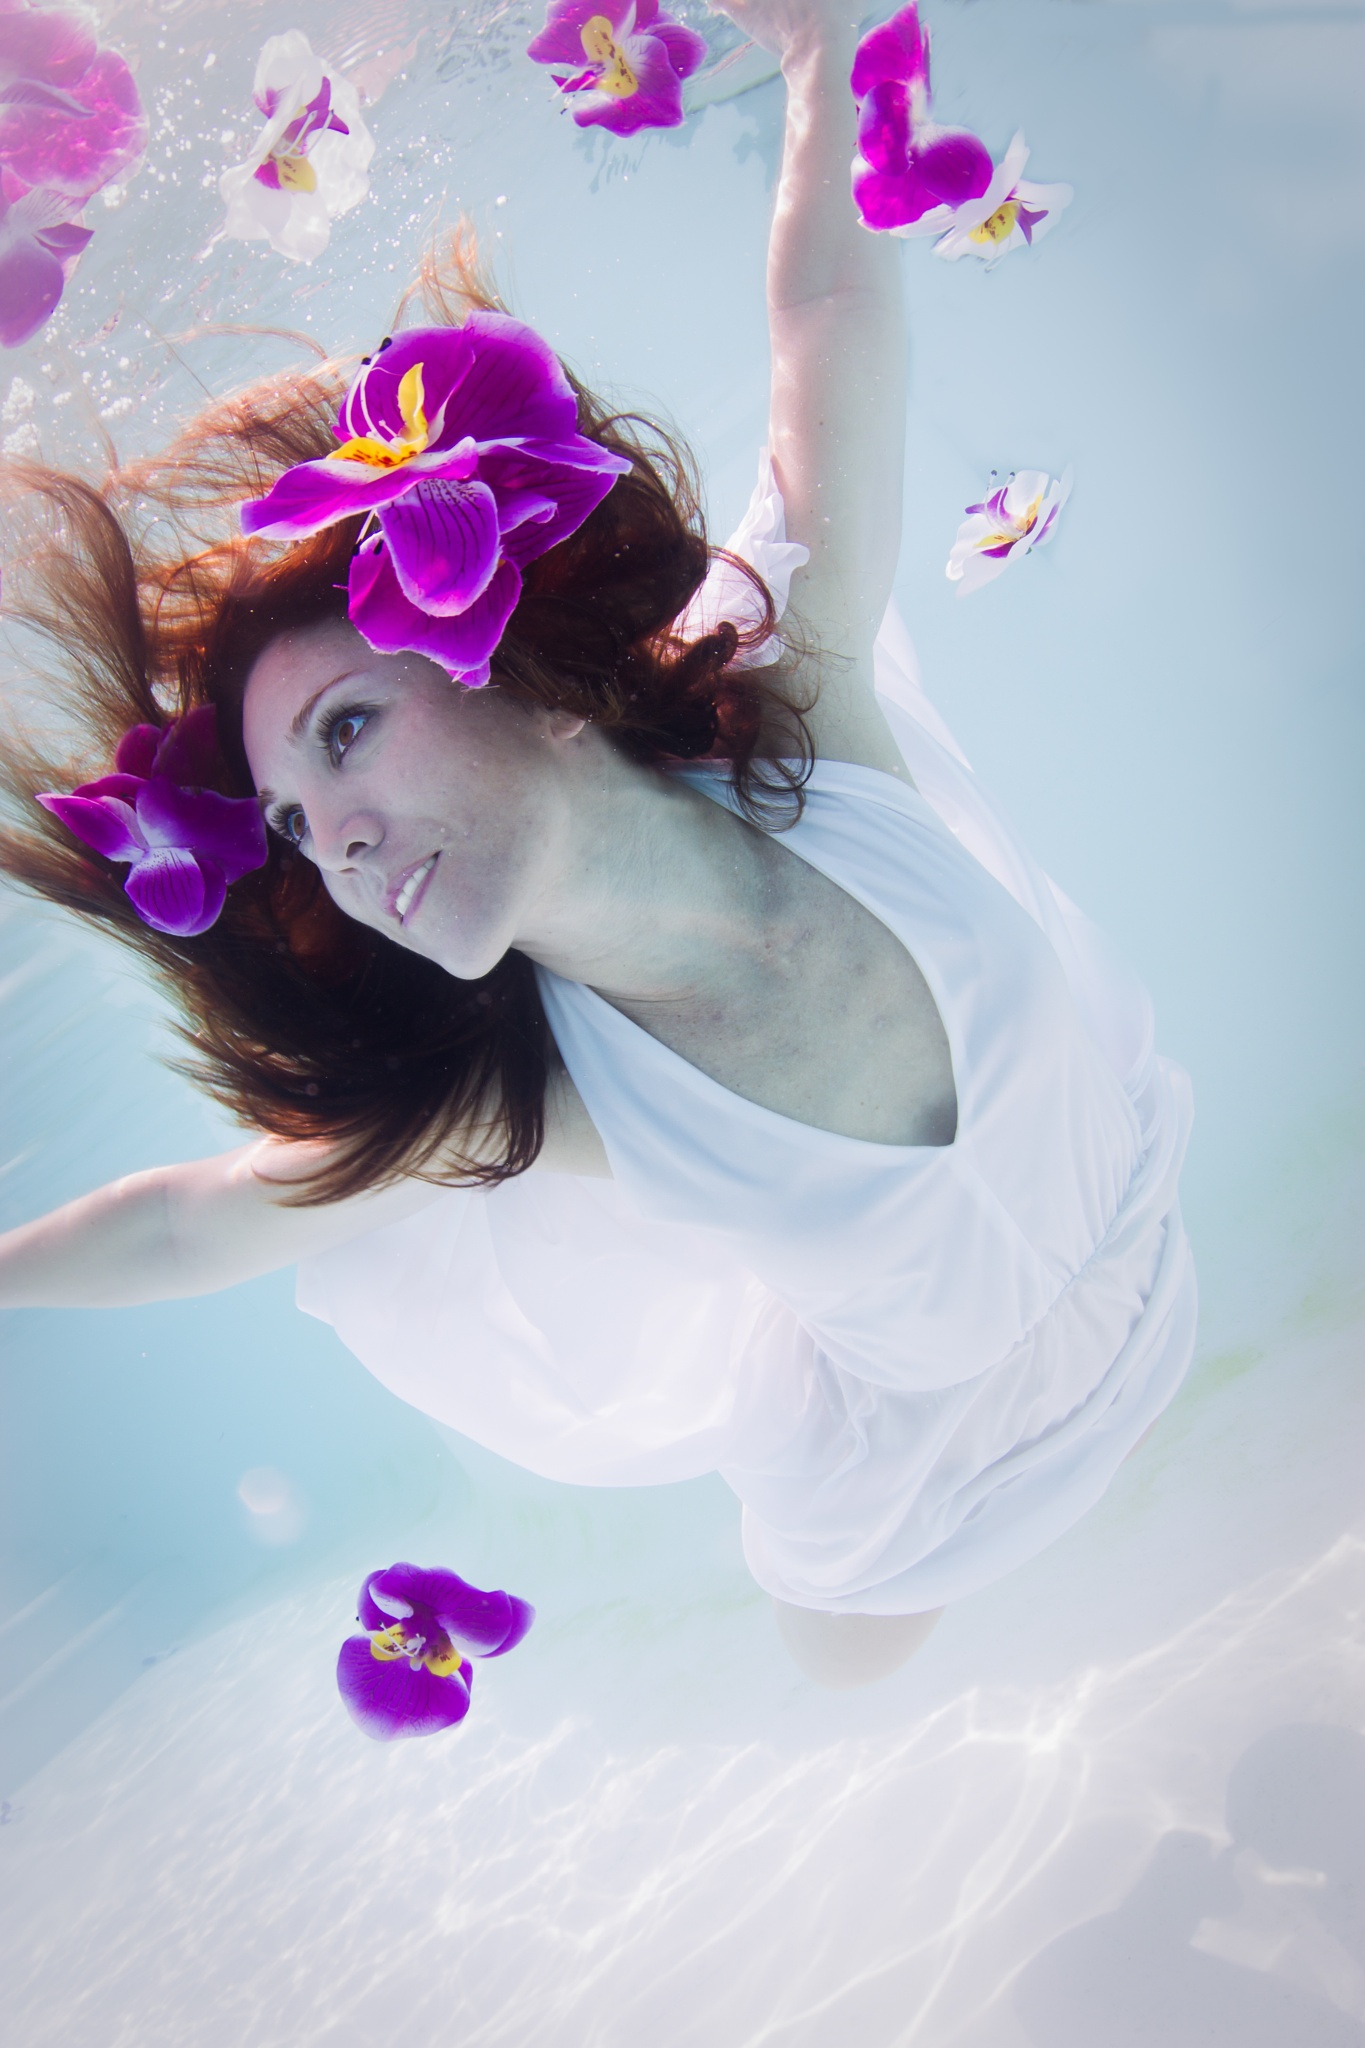 Orchid girl by Petra Van Borm